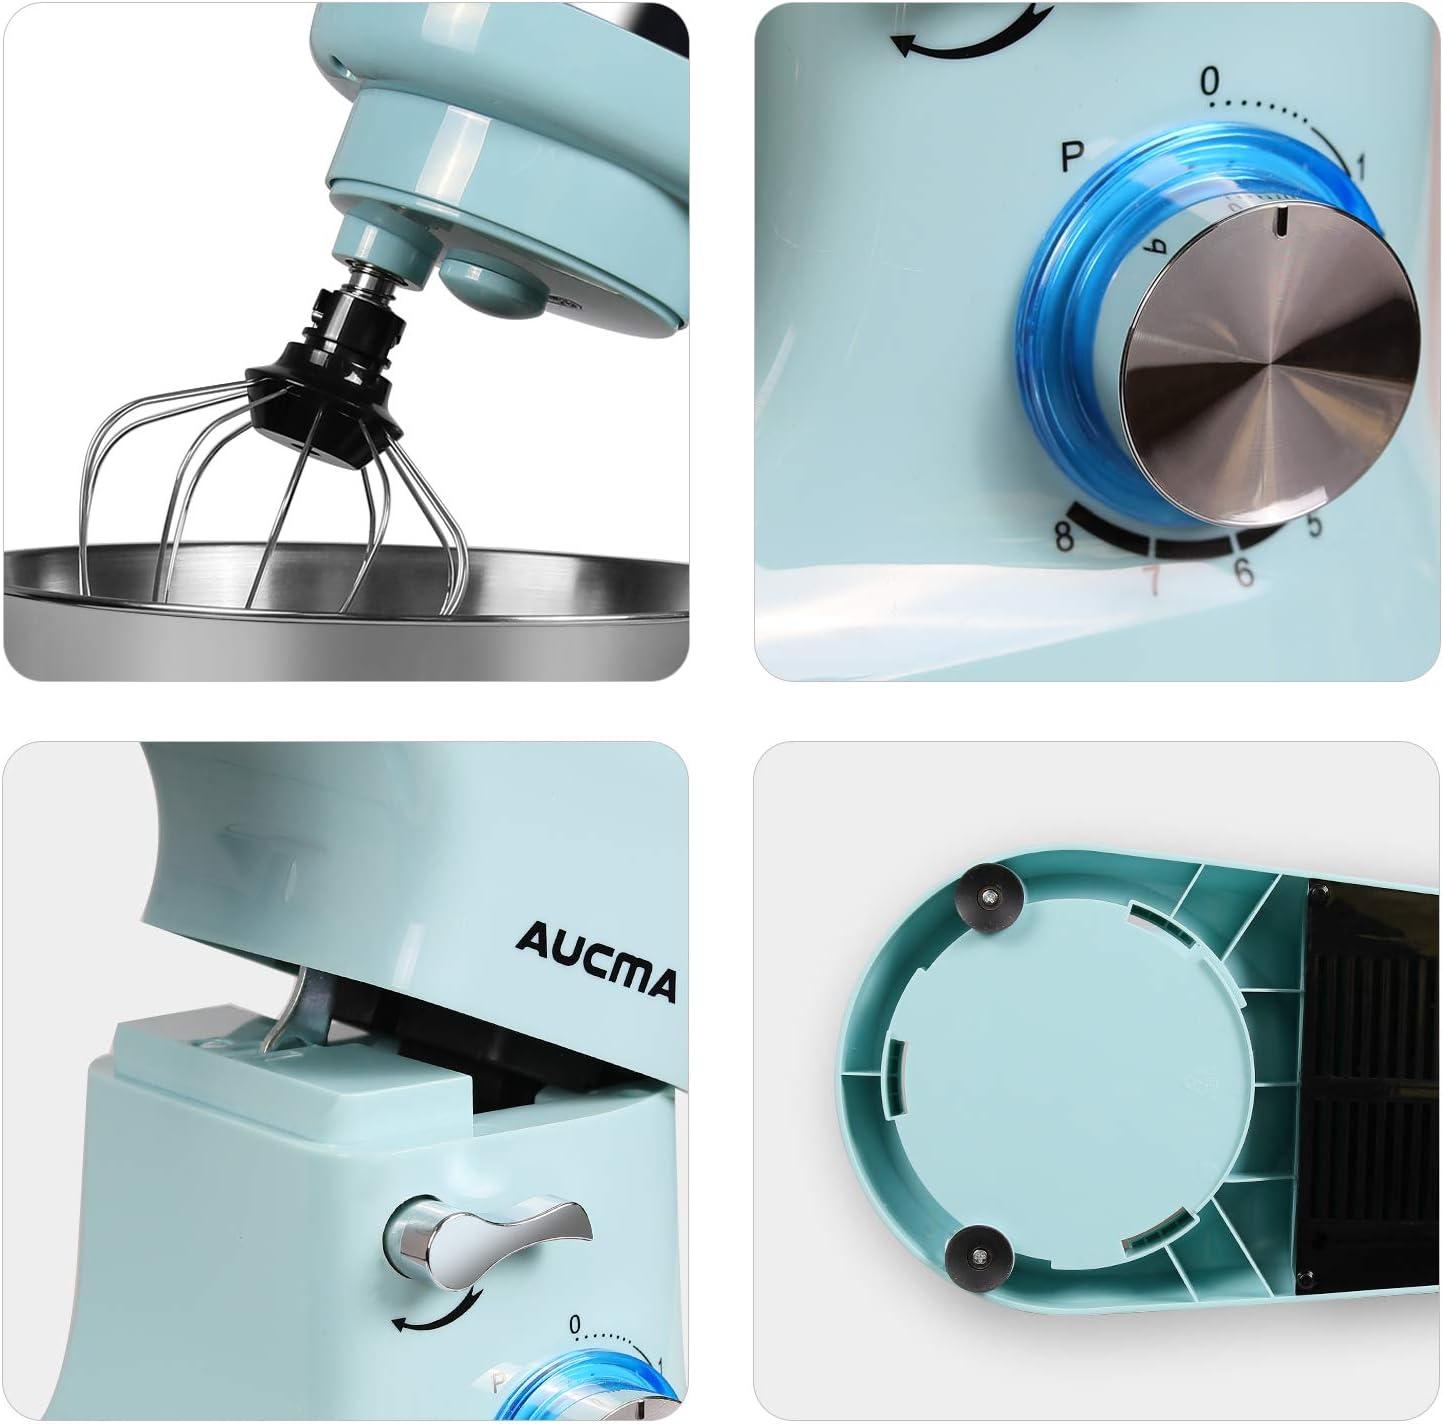 Clase de eficiencia energ/ética A+++ Batidora Amasadora Robot de Cocina con protecci/ón contra salpicaduras,8 niveles de velocidad AUCMA 5,5L Amasadora de Bajo Ruido para Reposter/ía